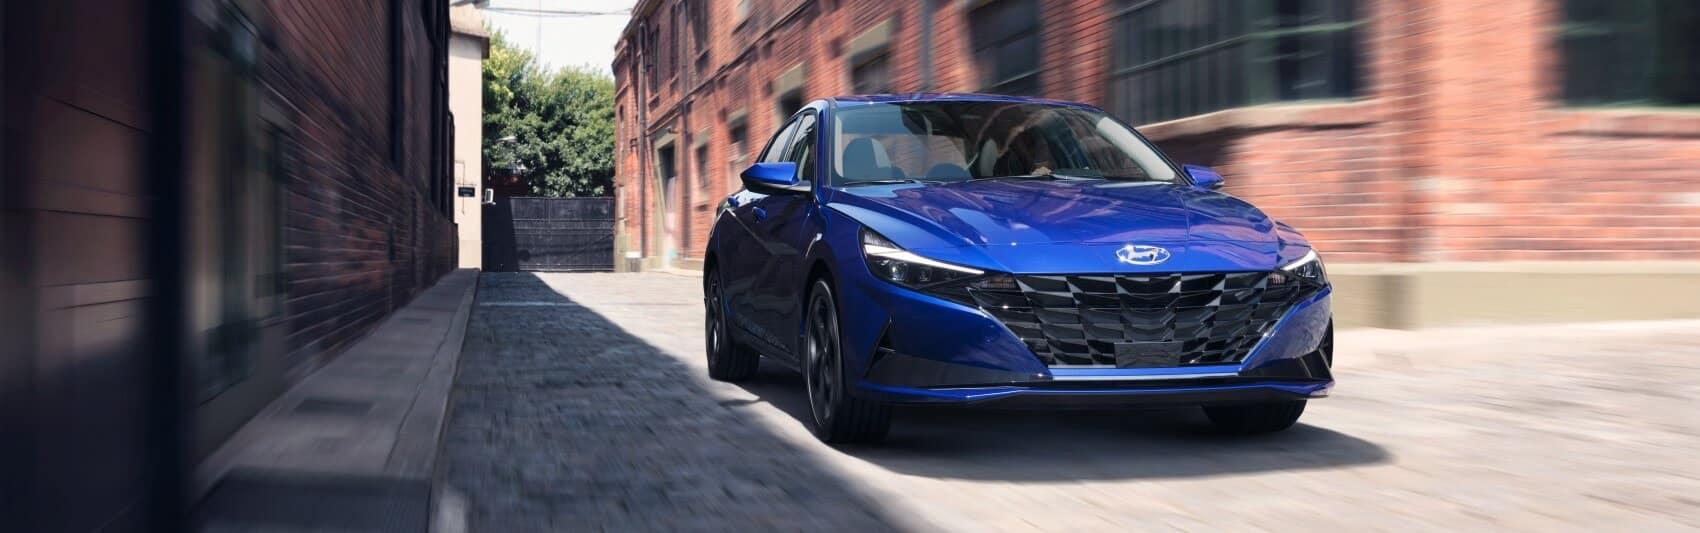 Hyundai Elantra Performance Intense Blue